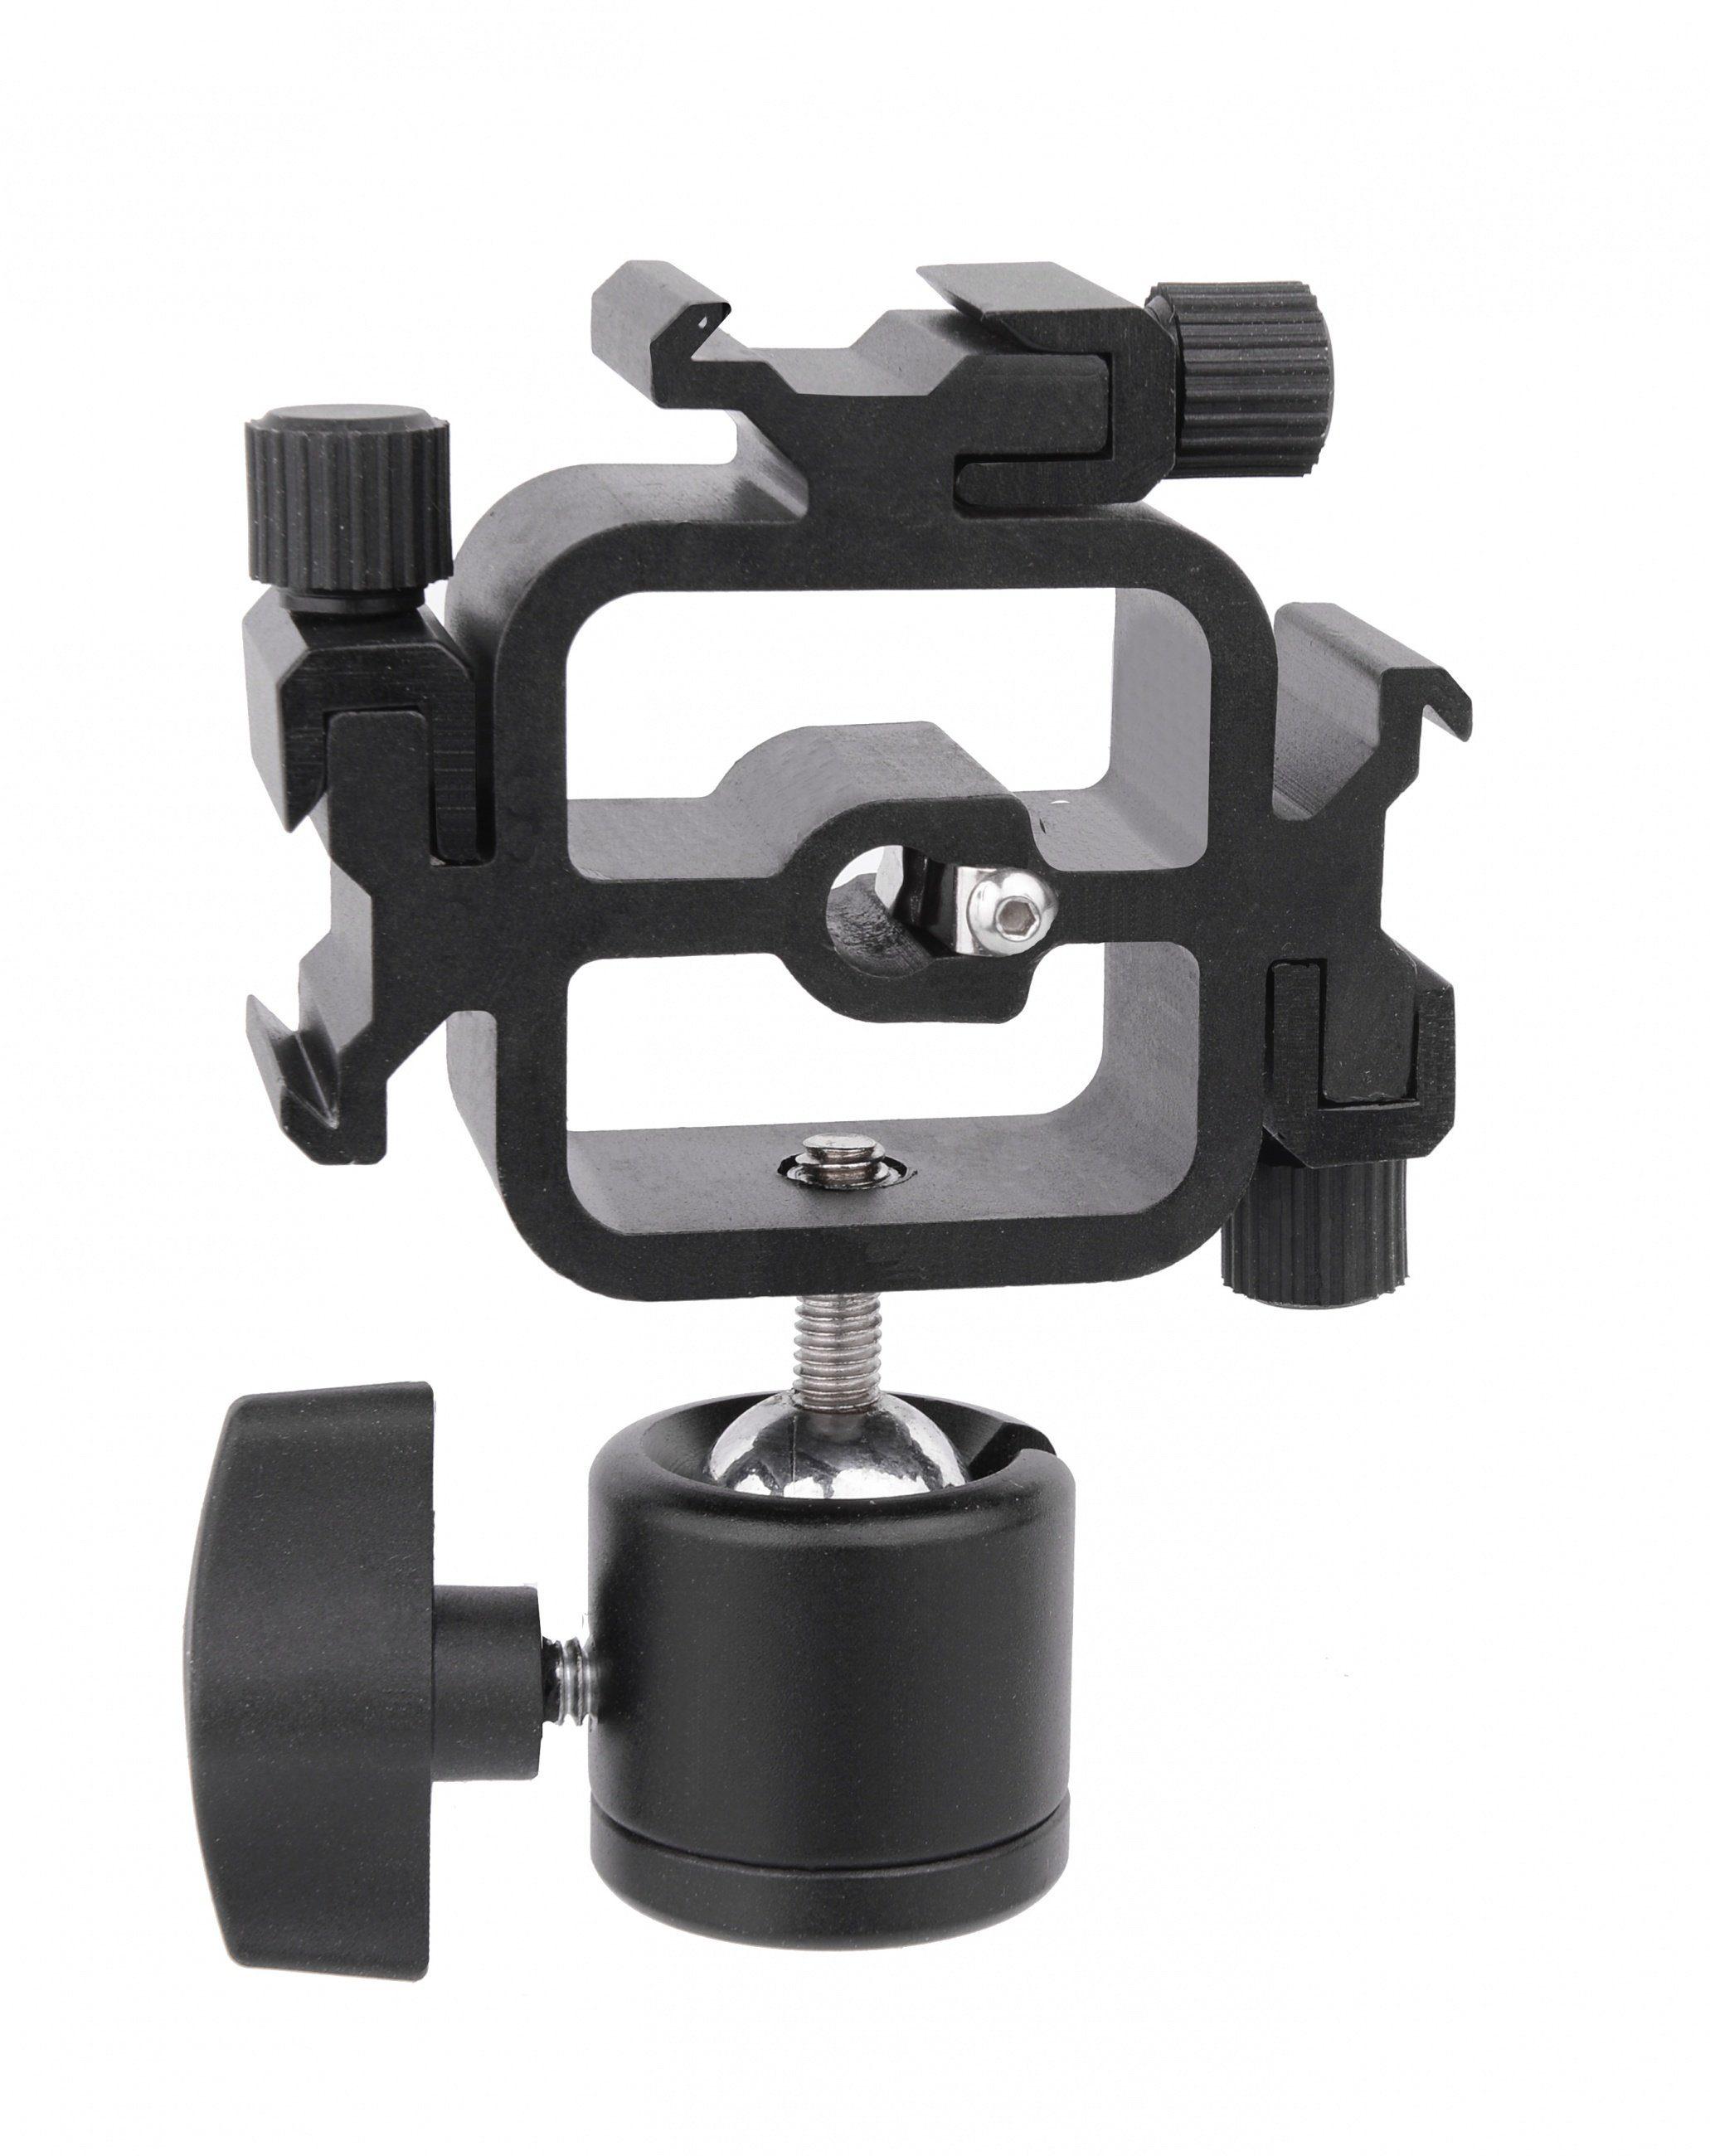 Bresser Fotostudio »JM-38 Blitzhalter für 3 Kamerablitze«